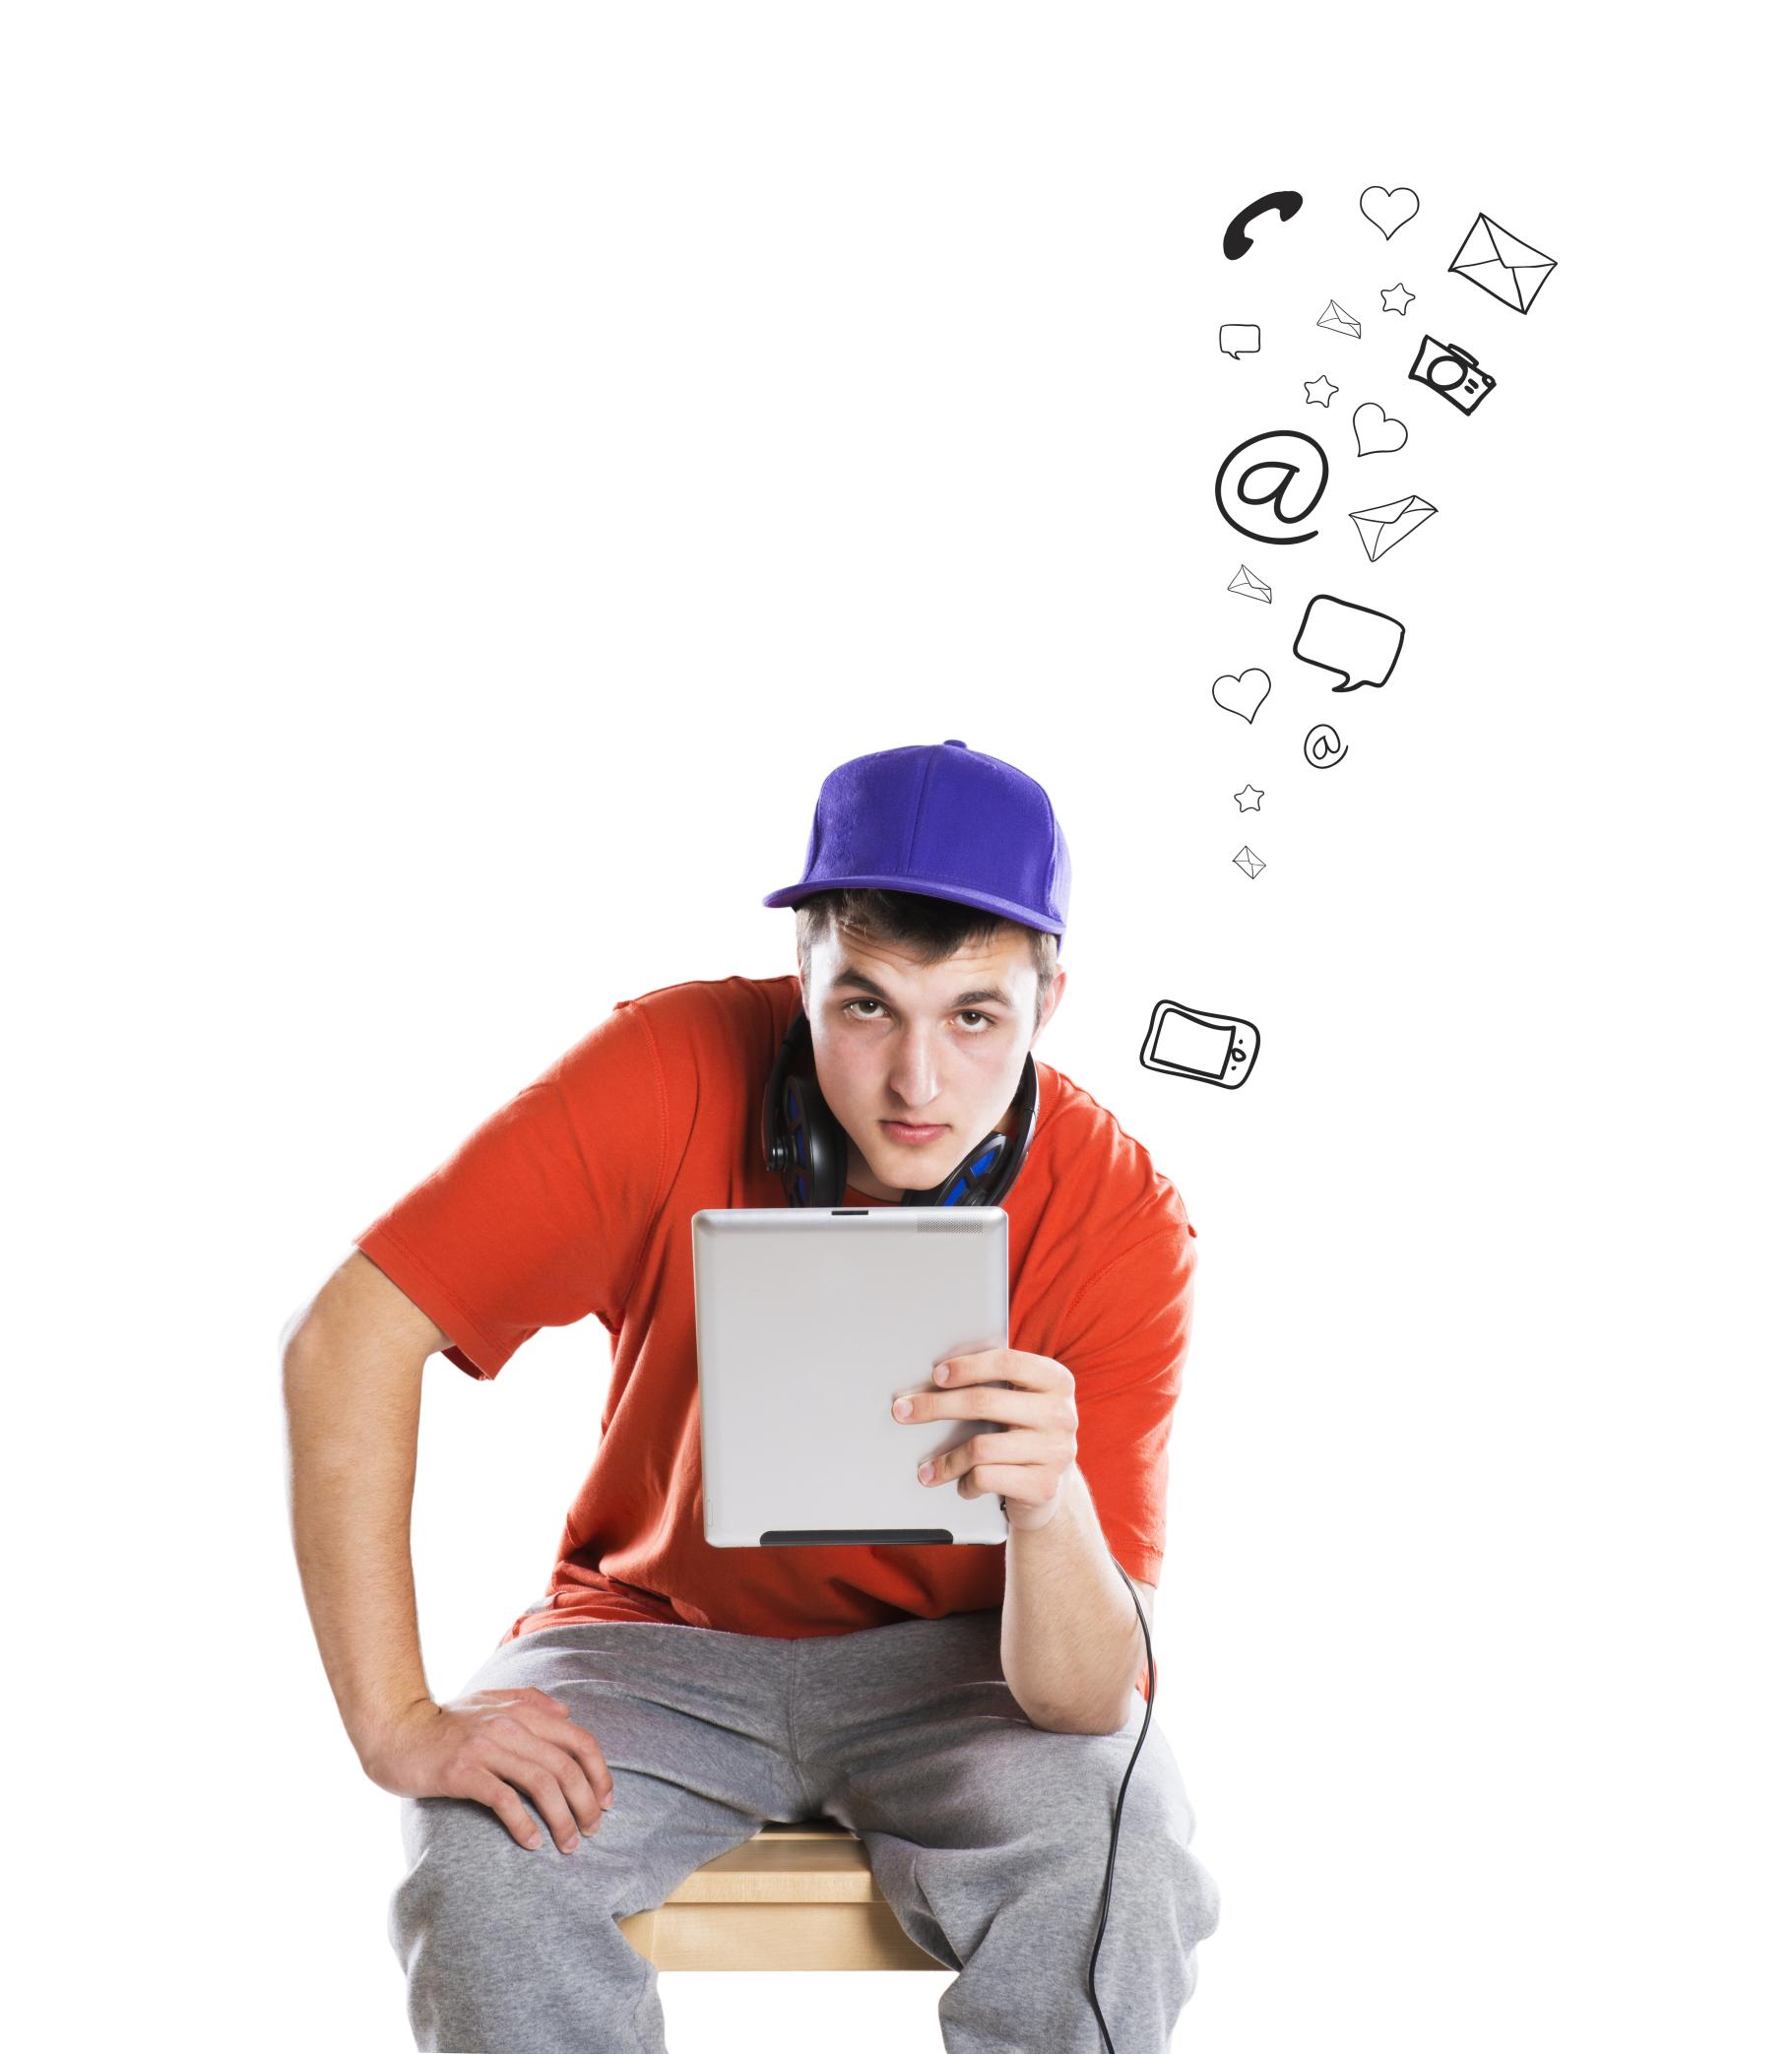 blogging in class